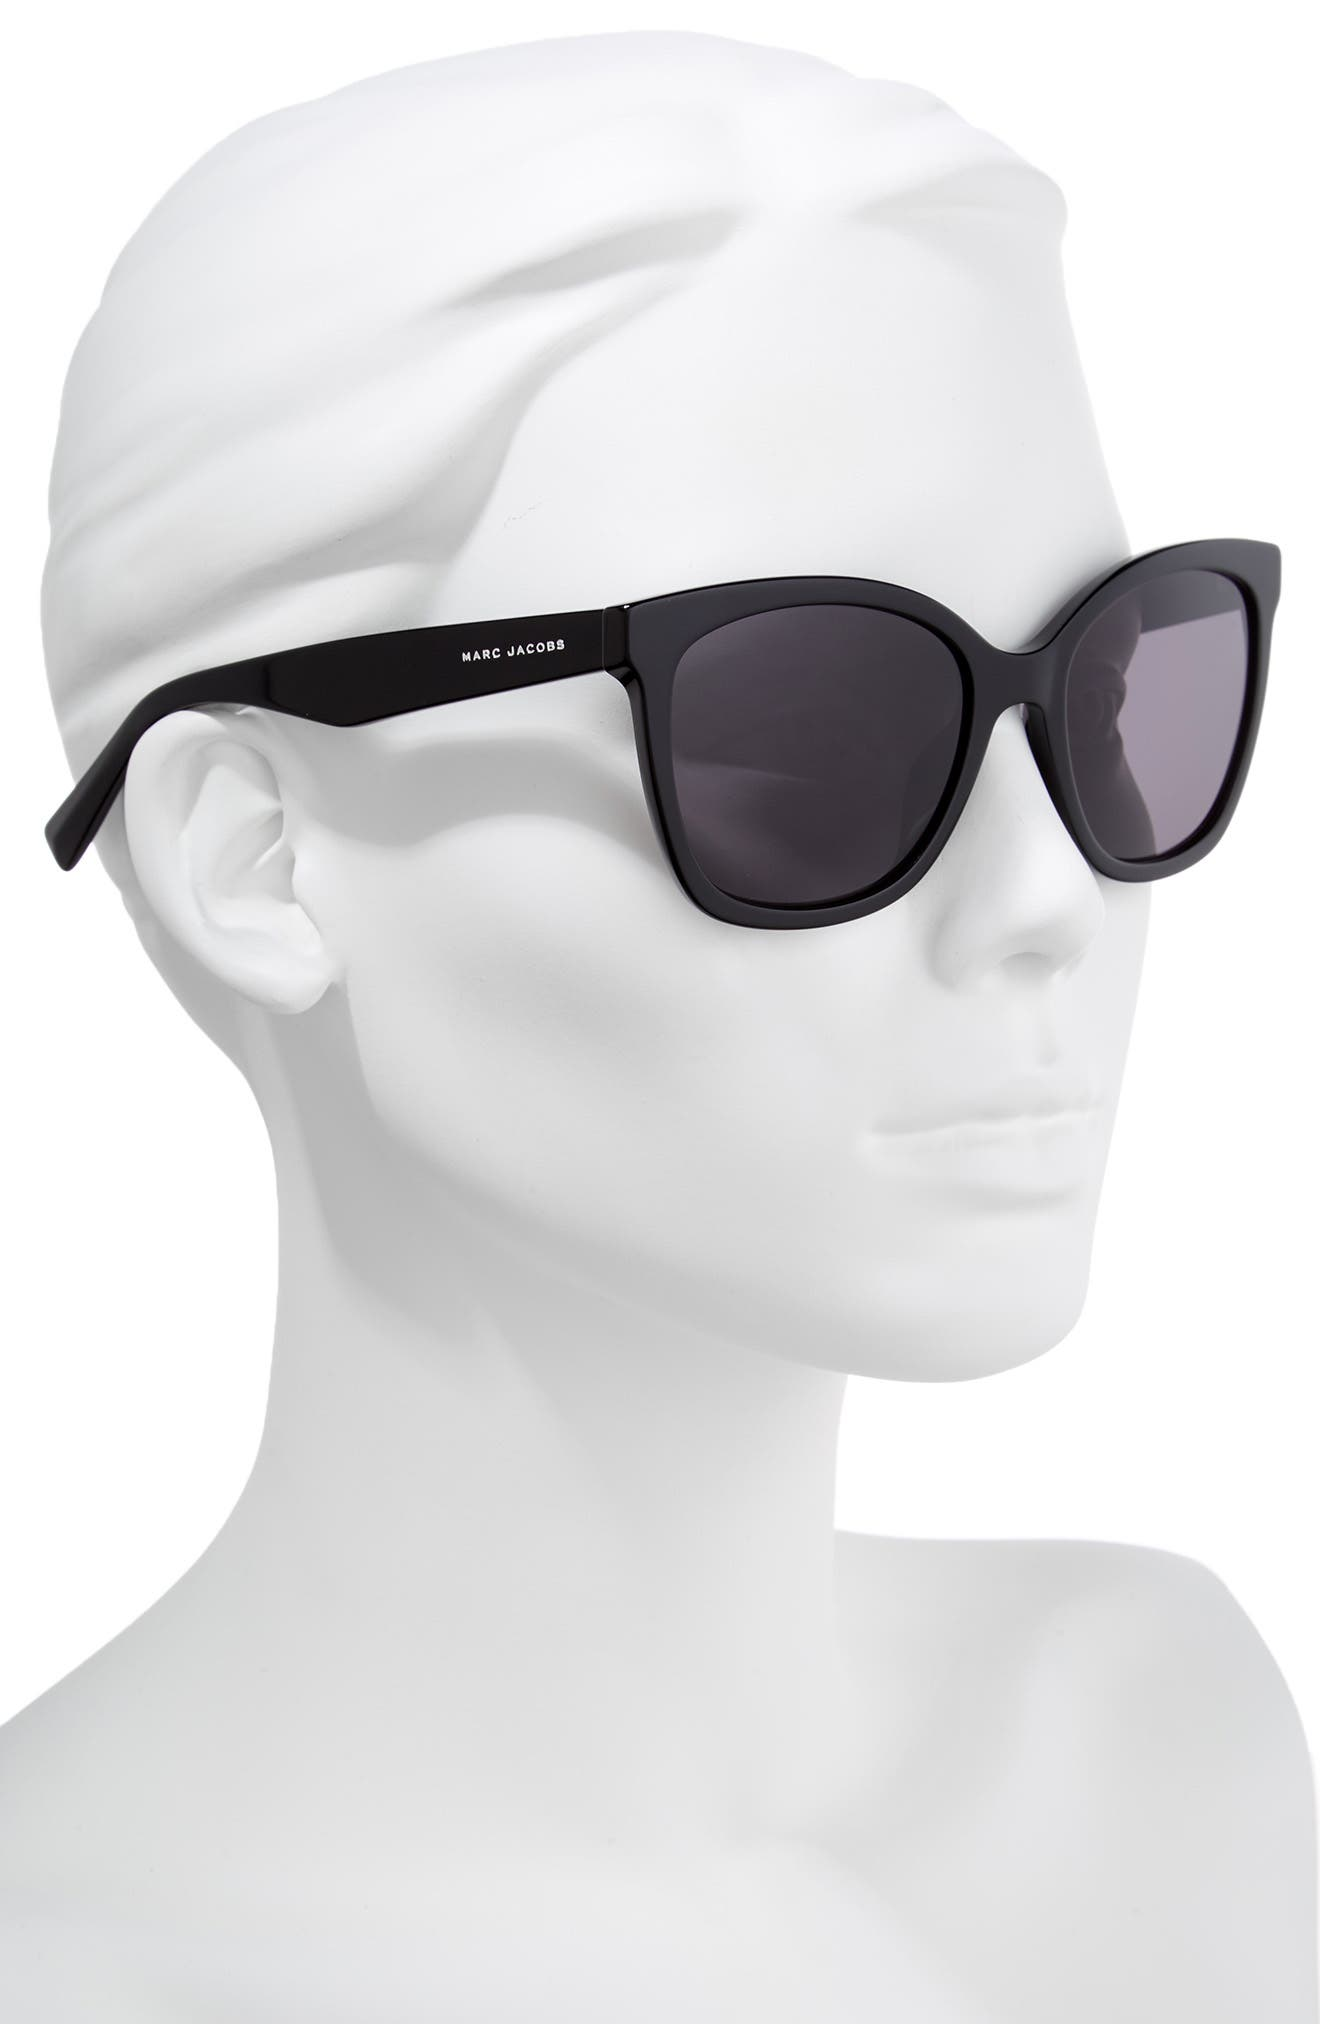 54mm Gradient Lens Sunglasses,                             Alternate thumbnail 2, color,                             Black Polar